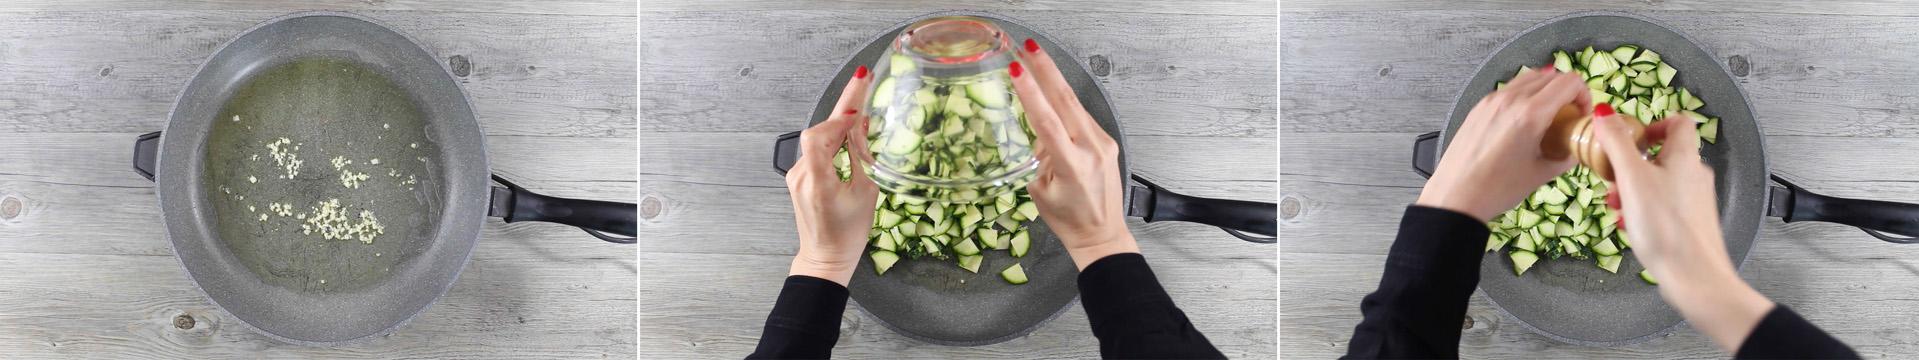 pasta-zucchine-e-curry-verdure